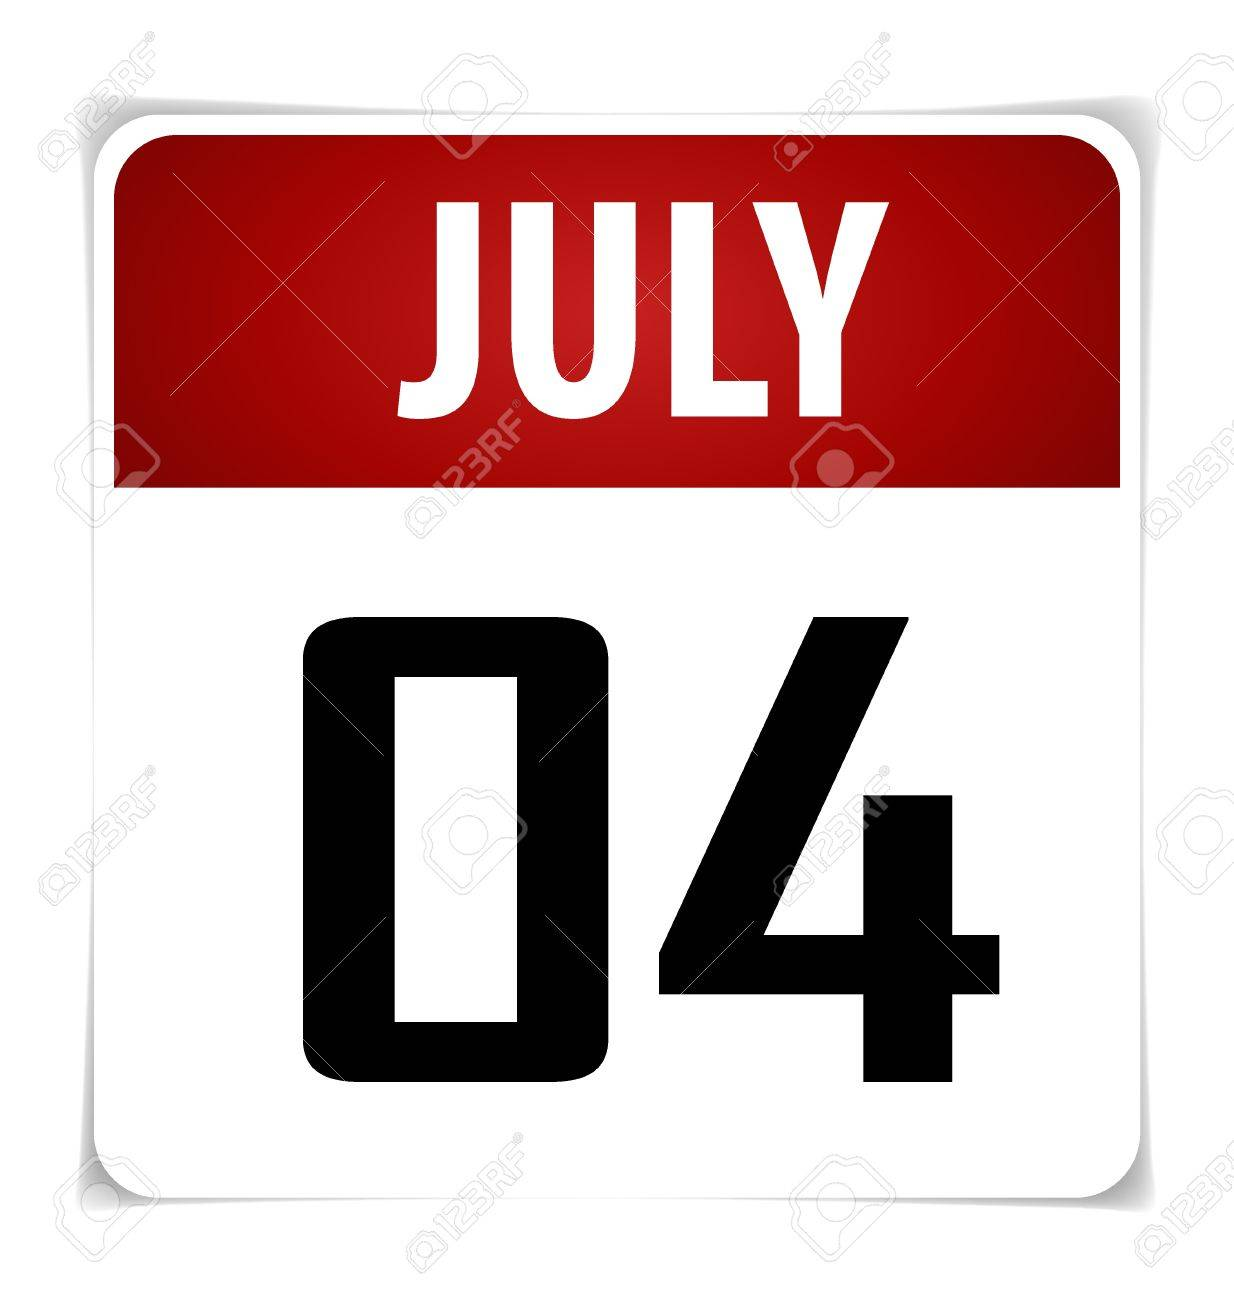 Simple Calendar Date- July 4th Stock Vector - 17101732